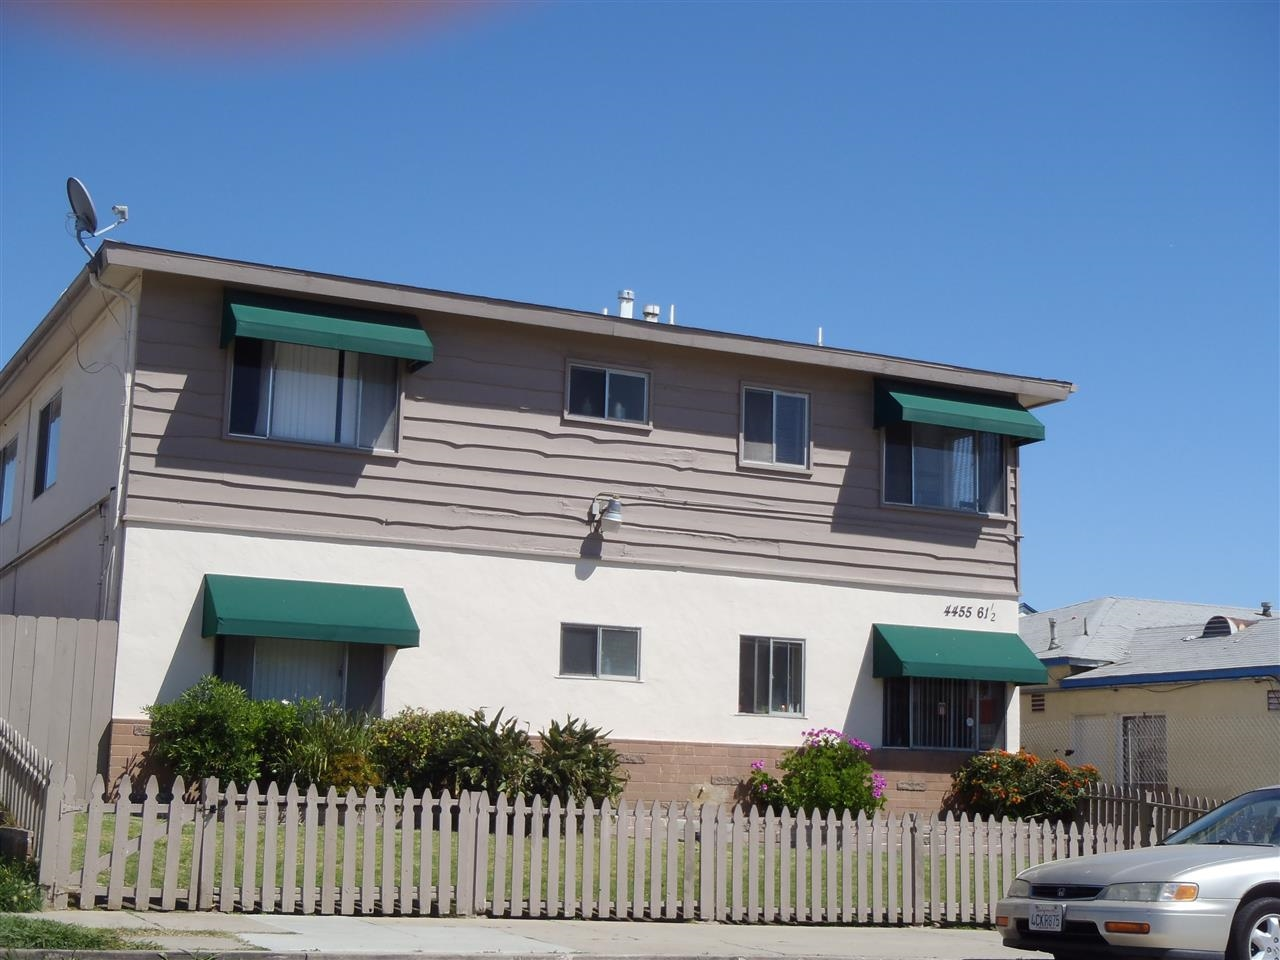 4455 52nd Street -  San Diego, CA 92115